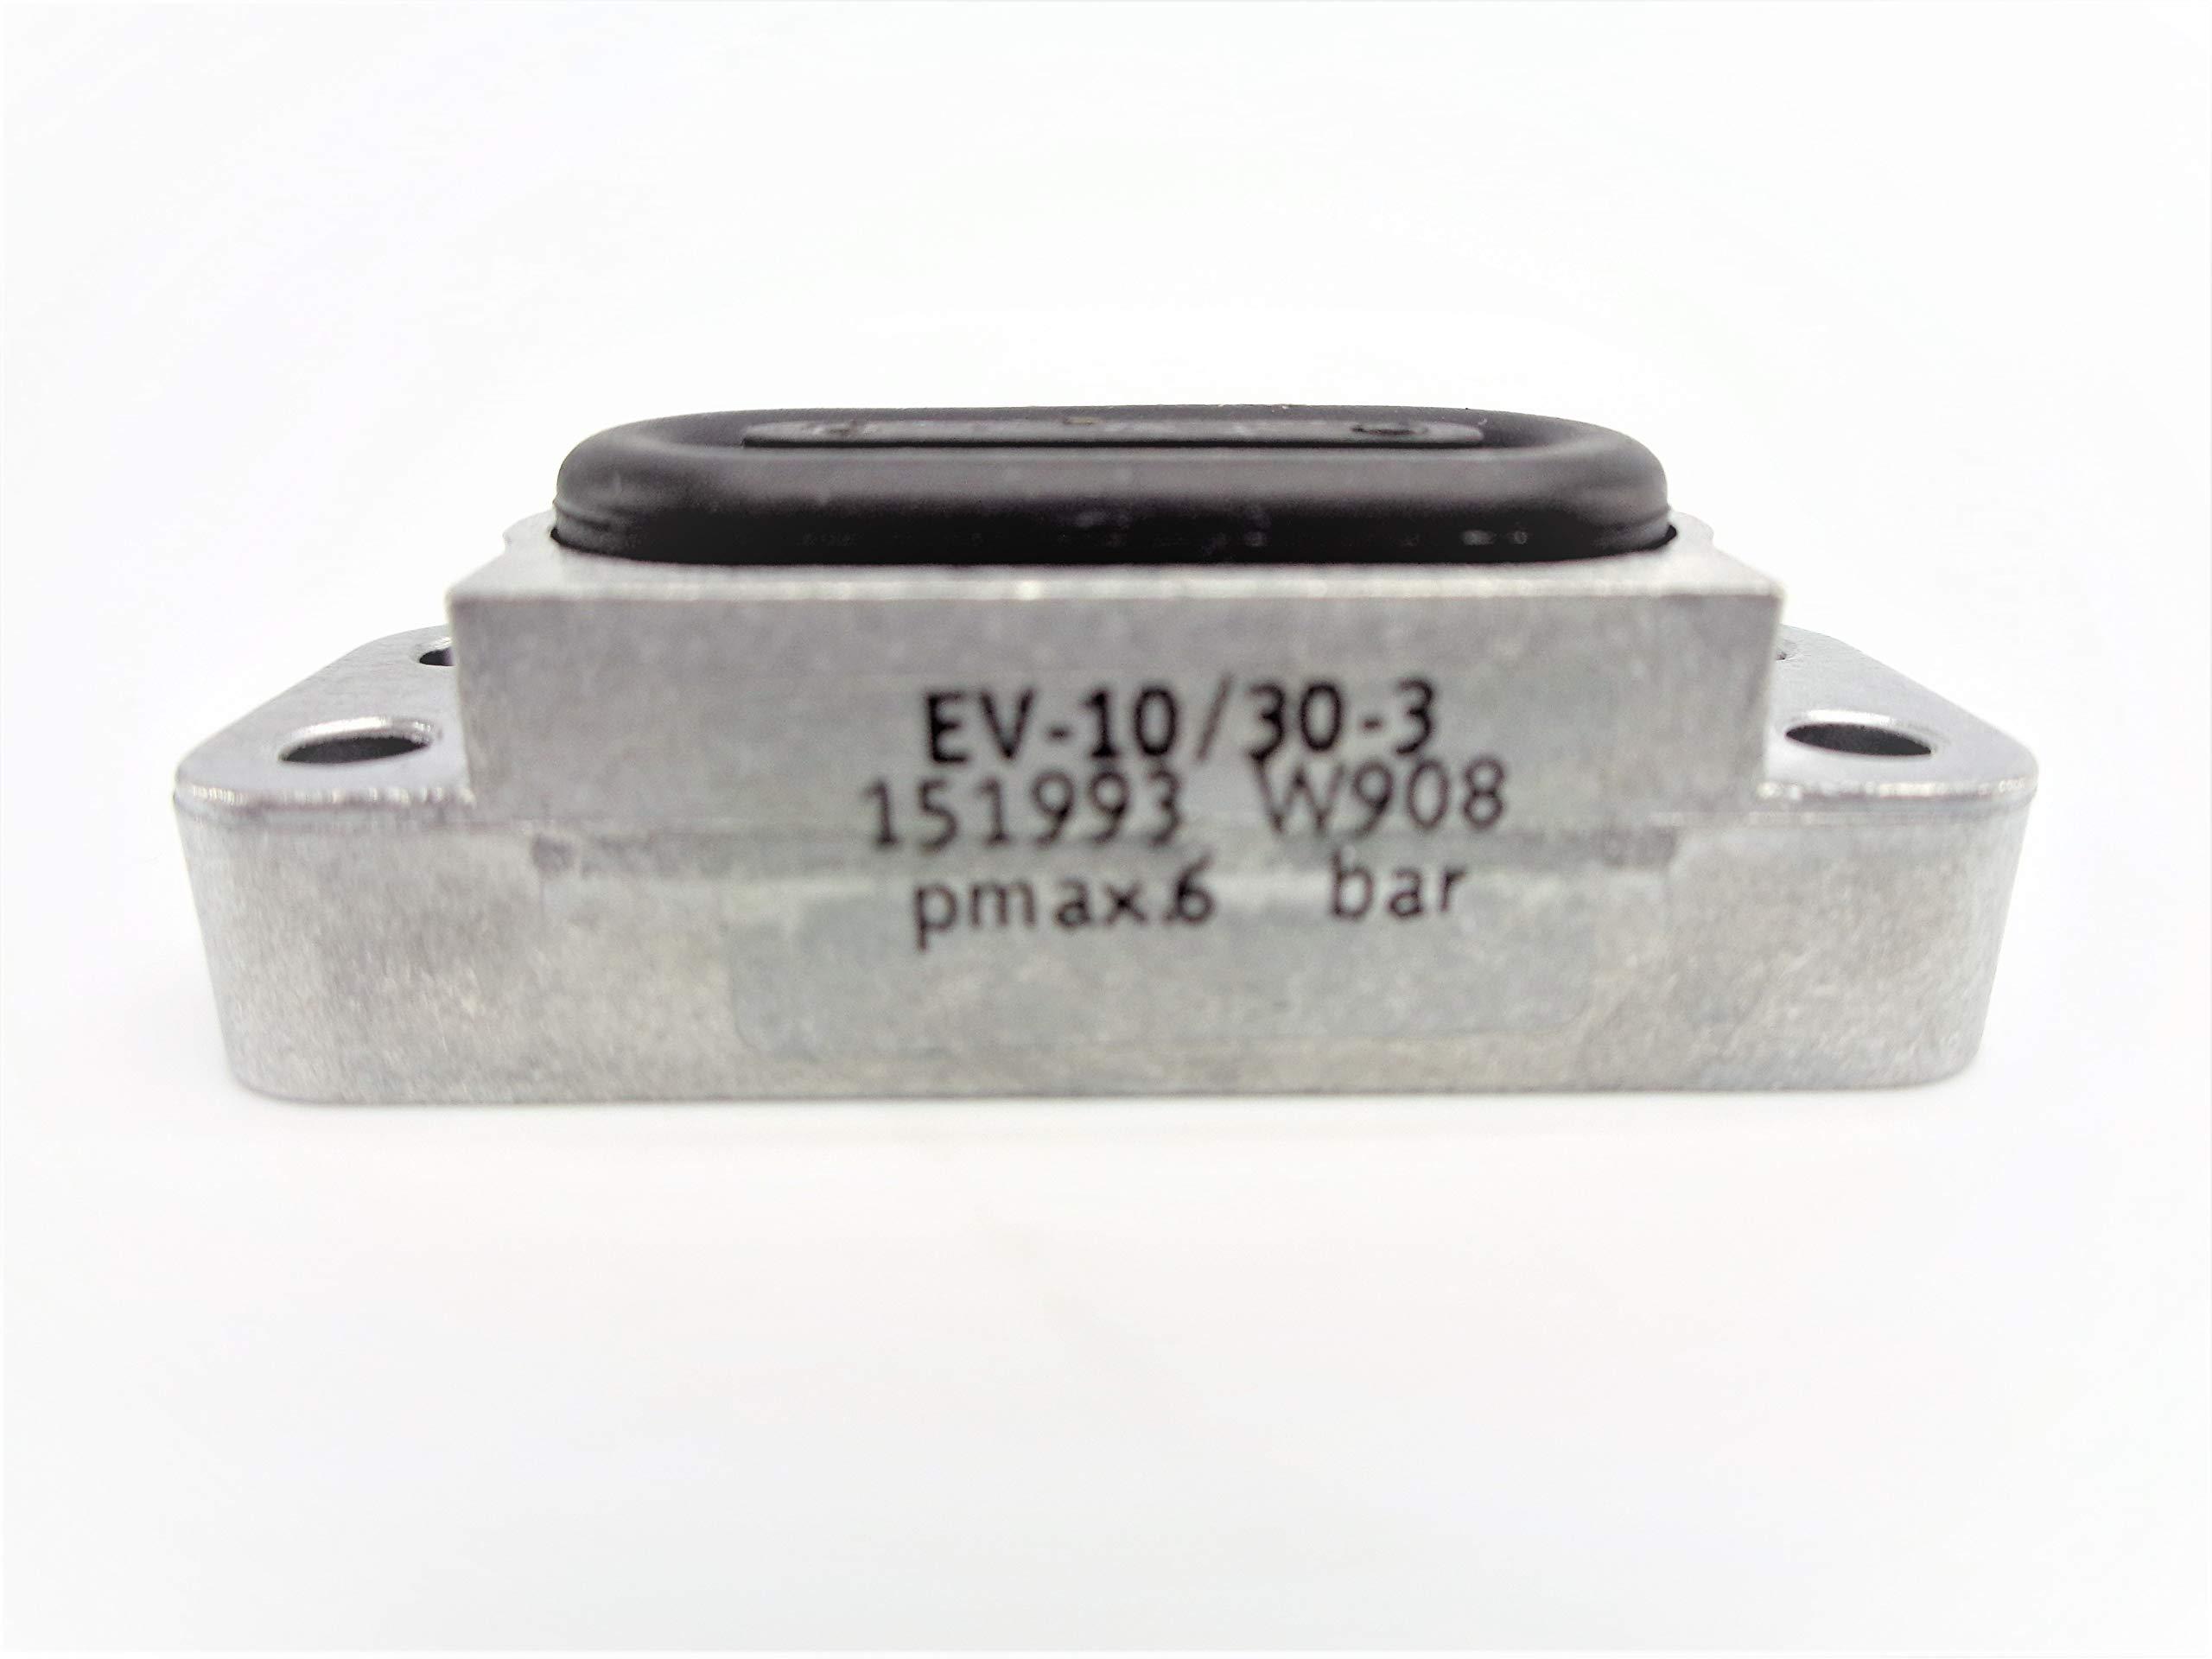 FESTO EV-10/30-3 151993 NSNP